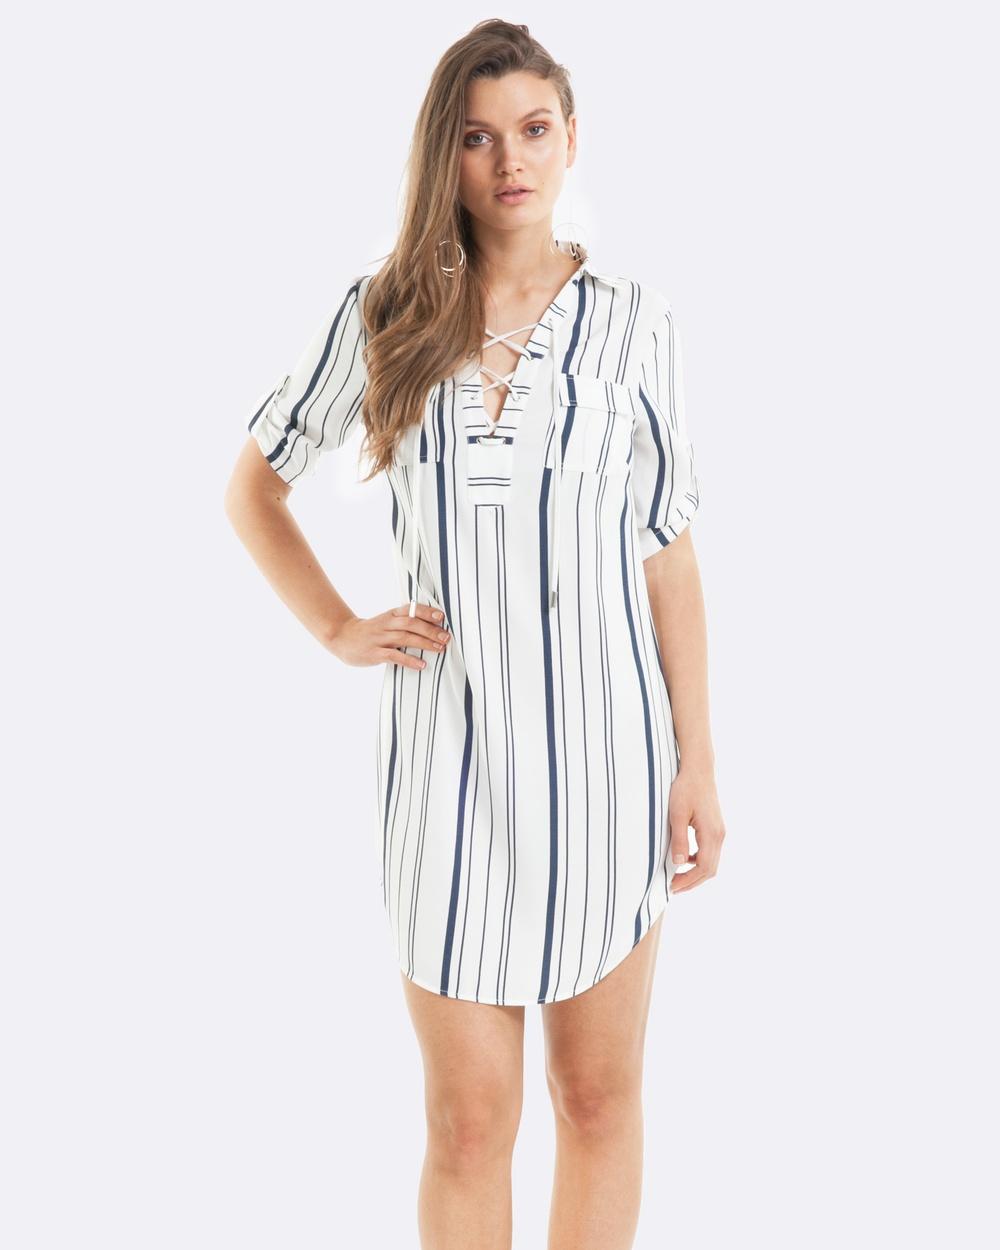 Amelius Alexis Shirt Dress Dresses Multi Alexis Shirt Dress